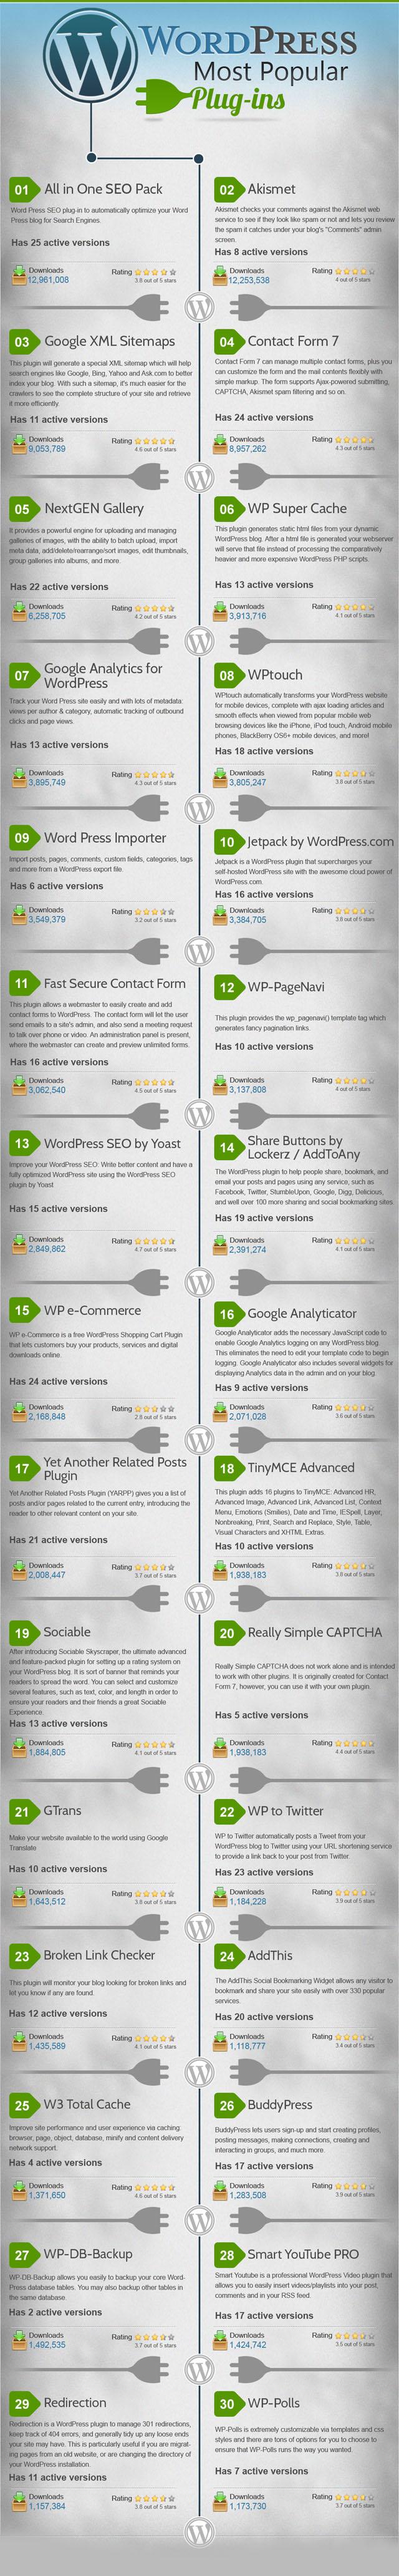 En İyi 30 WordPress Eklentisi [İnfografik] 2